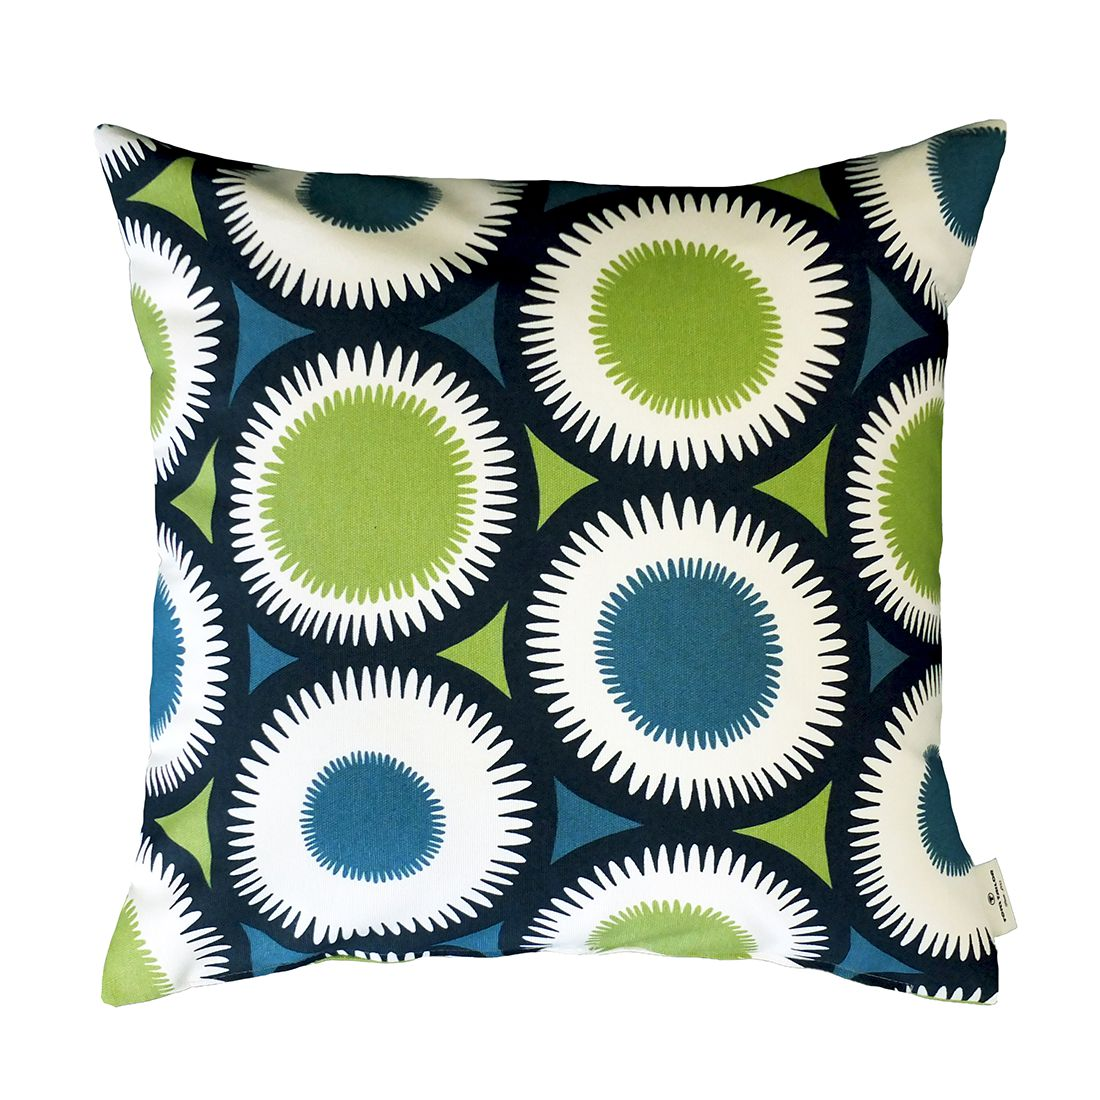 kissenh lle t painted daisy blau gr n ma e 50 x 50 cm. Black Bedroom Furniture Sets. Home Design Ideas